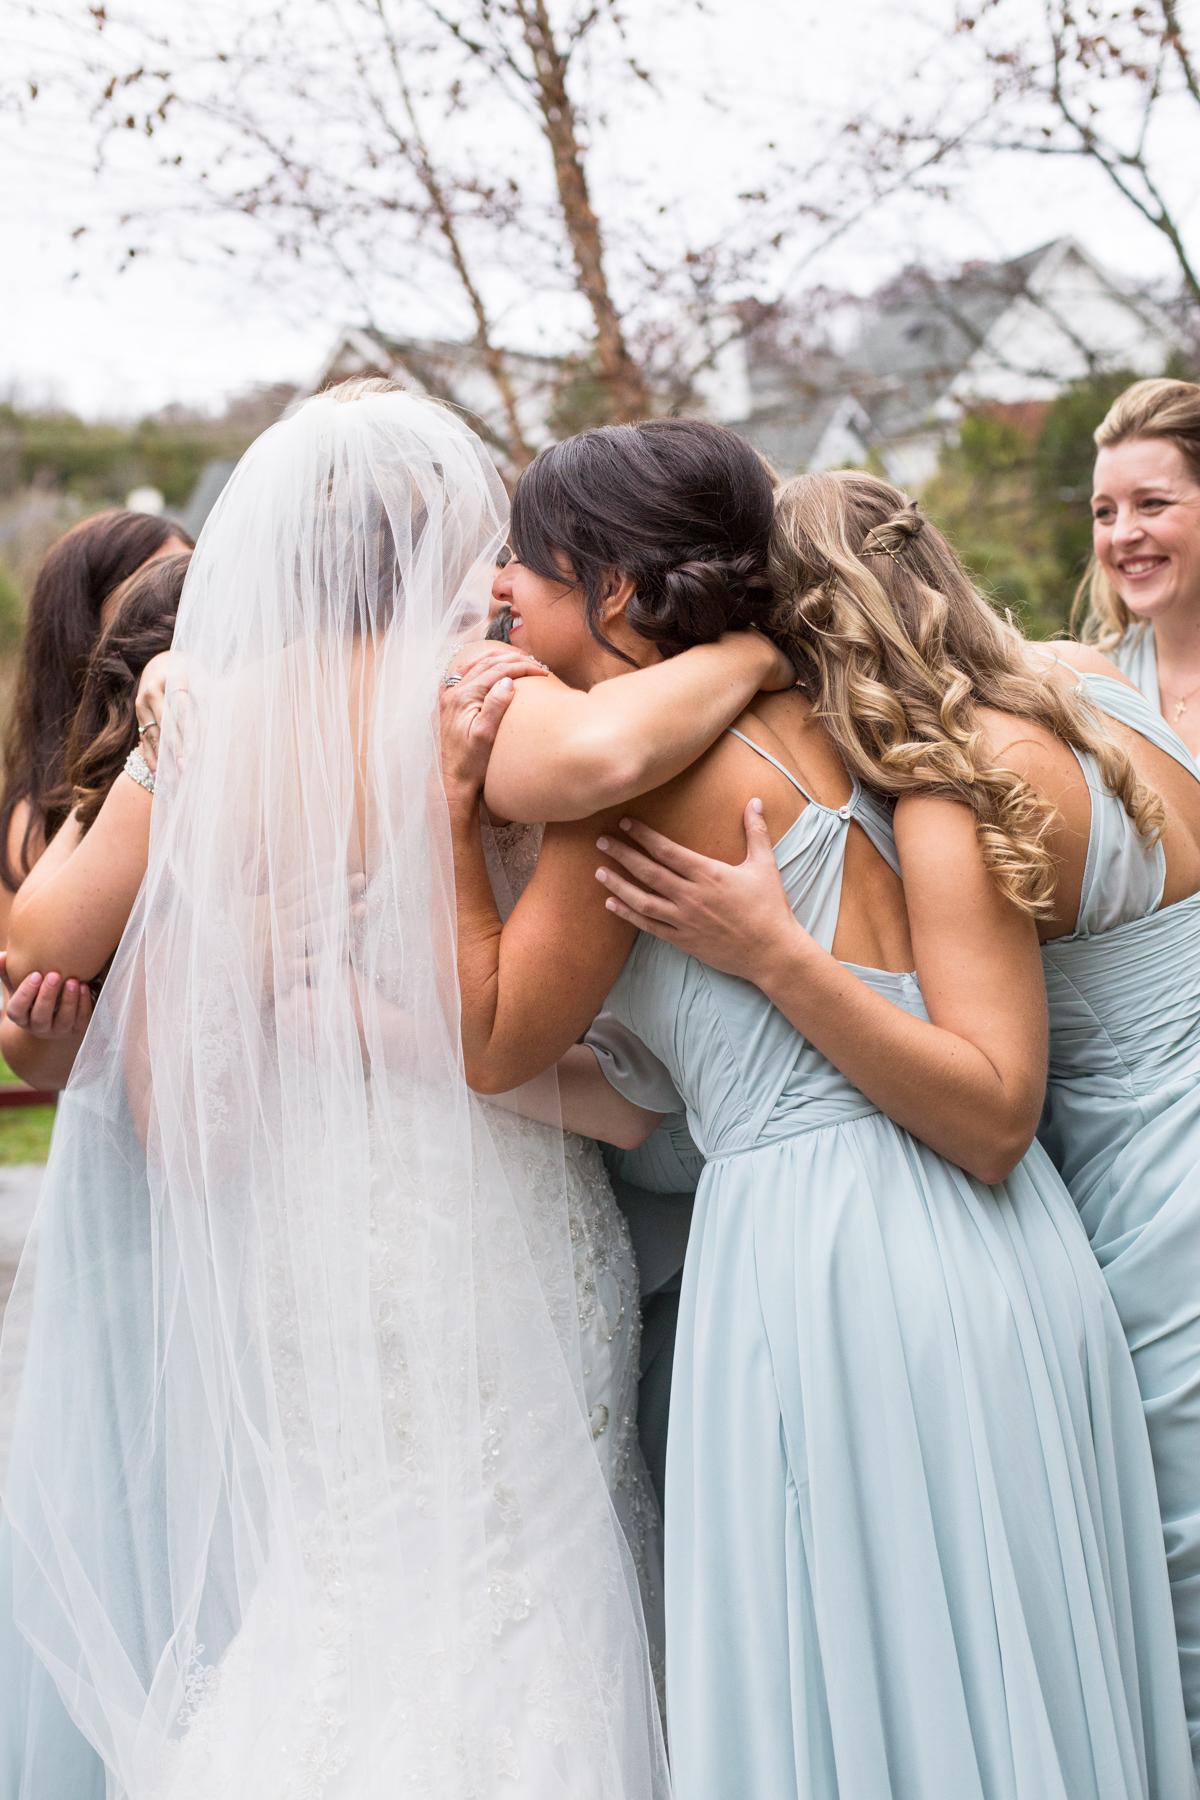 Kelli-and-Matt-Nashville-Wedding-Sneak-Peak-0086.jpg